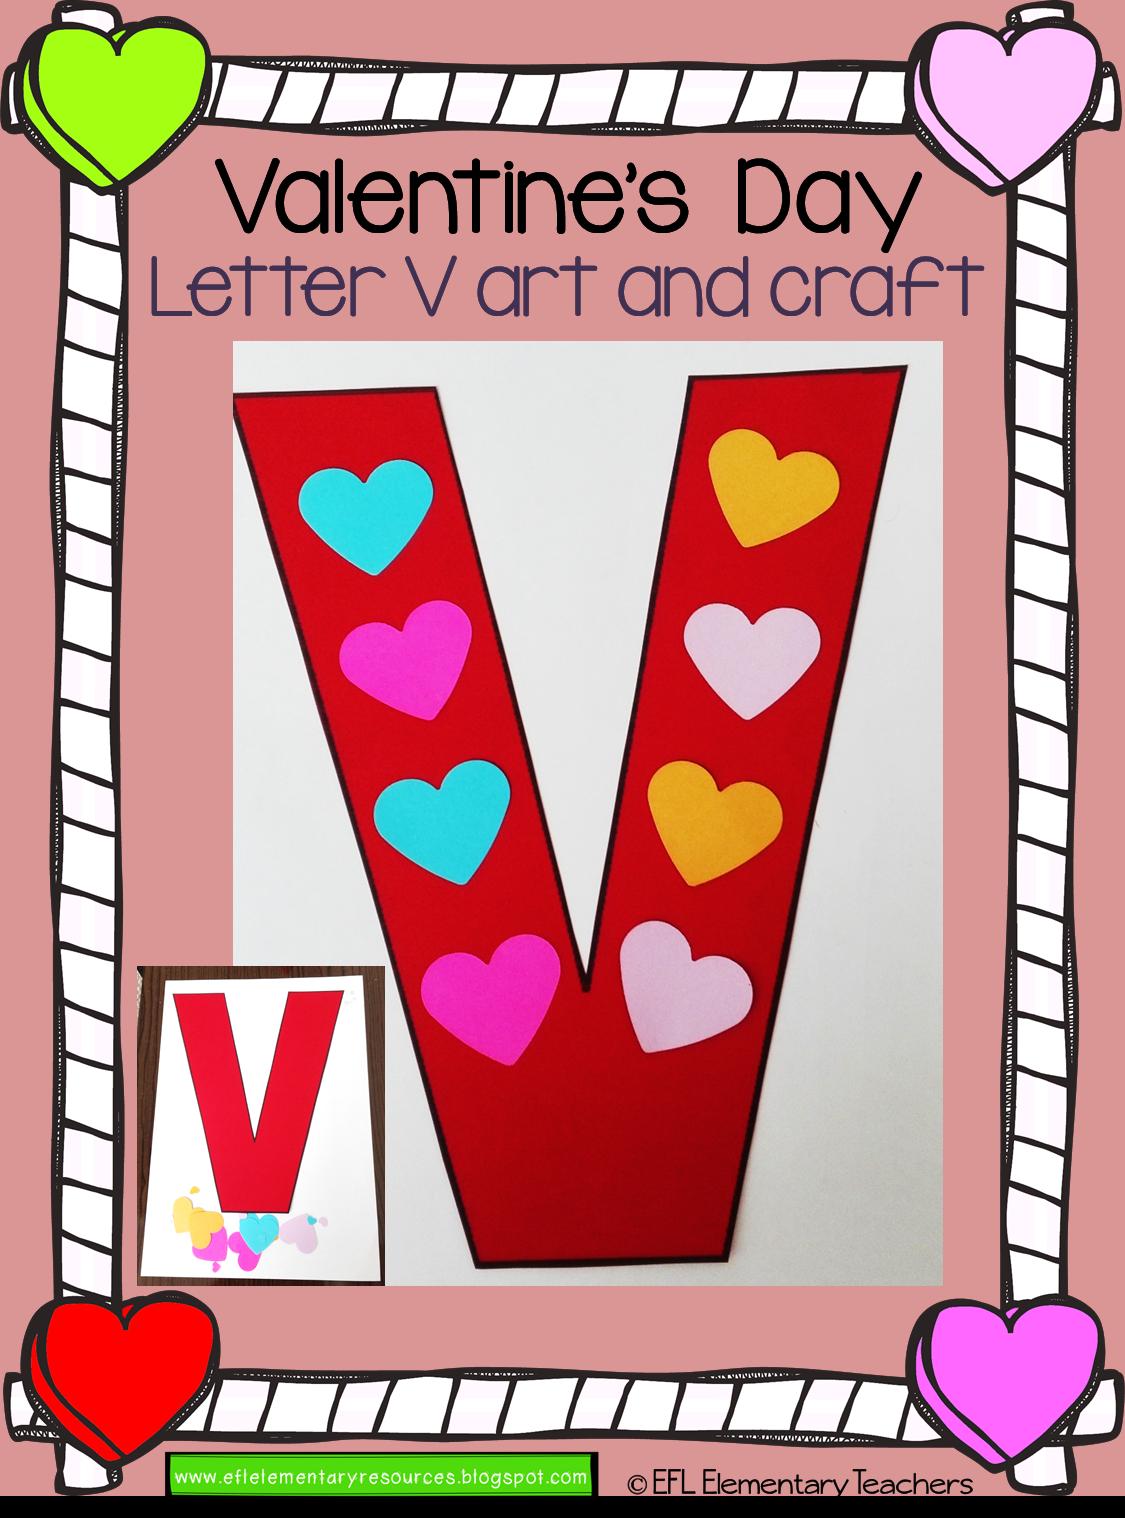 Clothespin clipart letter. Esl efl preschool teachers